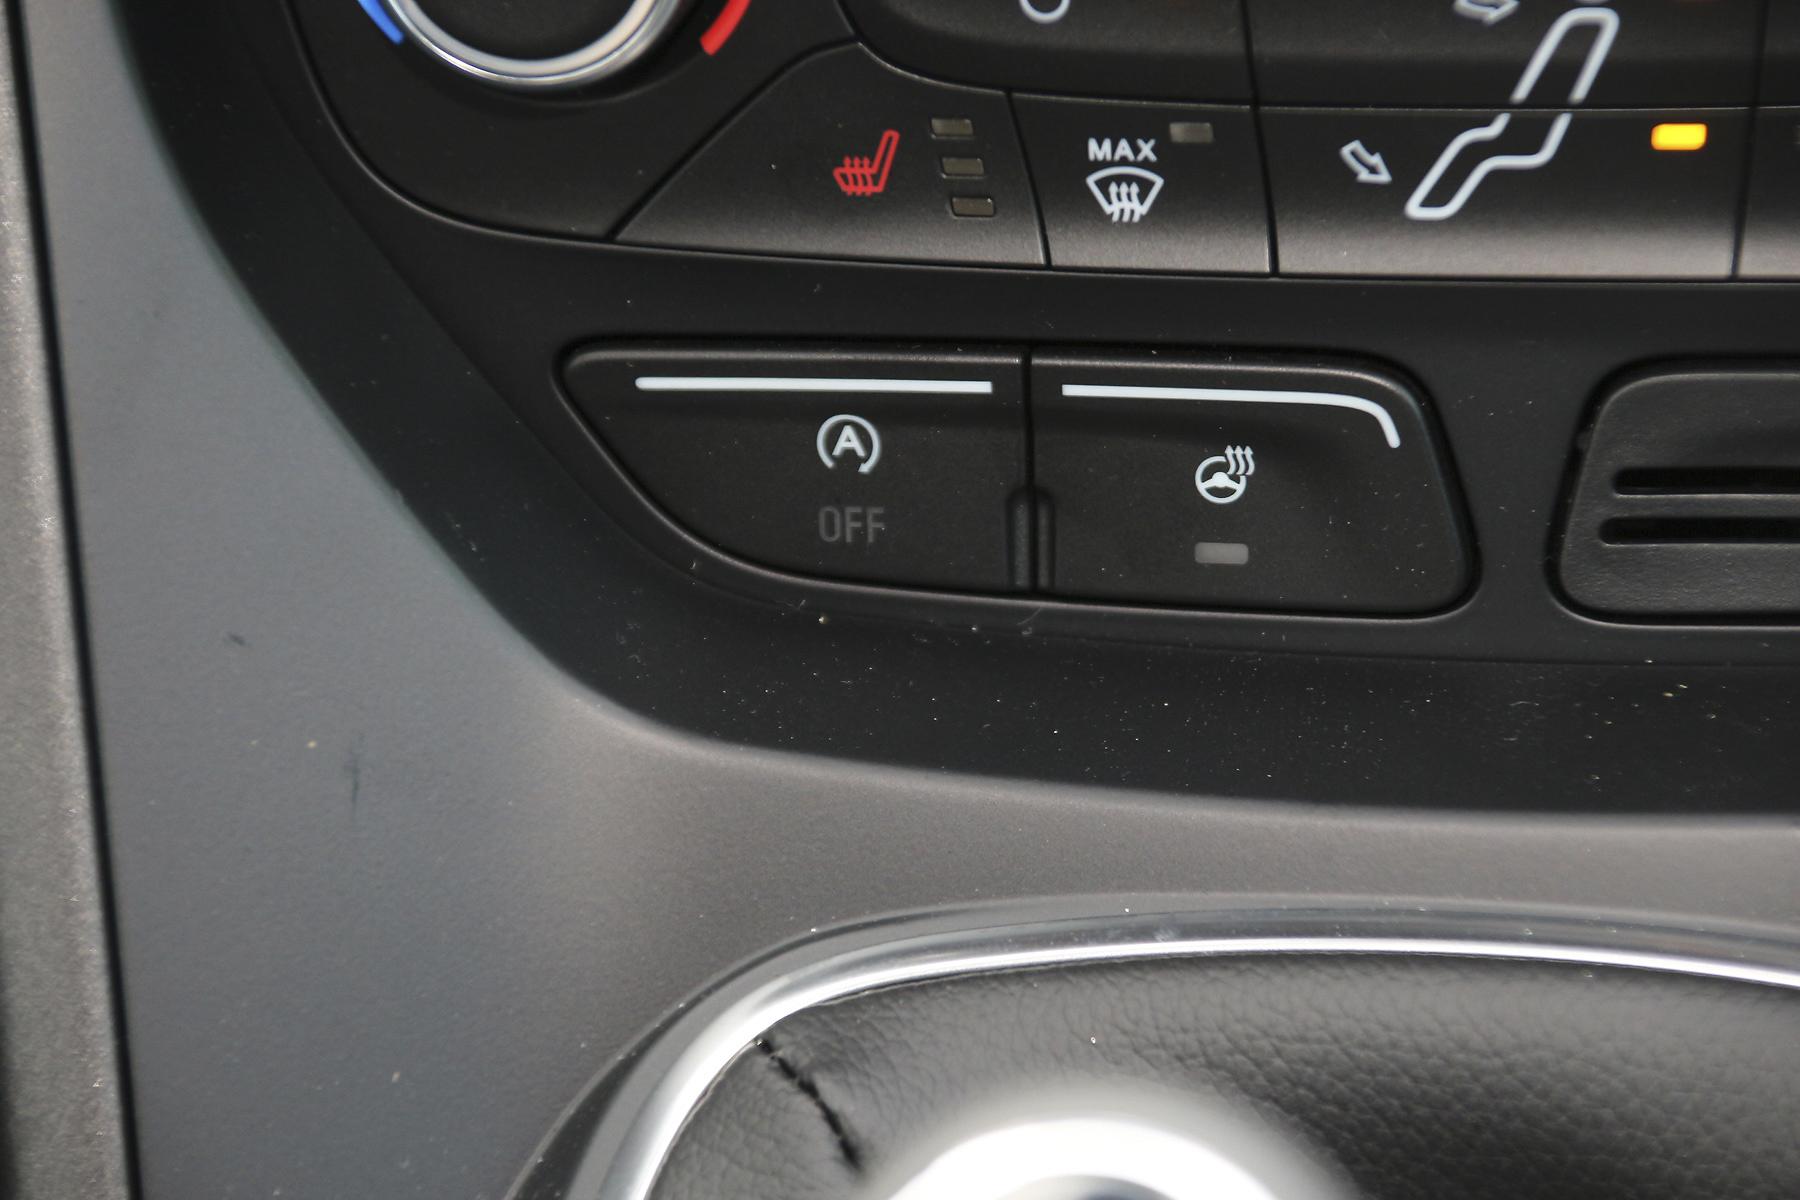 ford c-max 1.0 ecoboost trend startstopp winterp. | autos kauft man